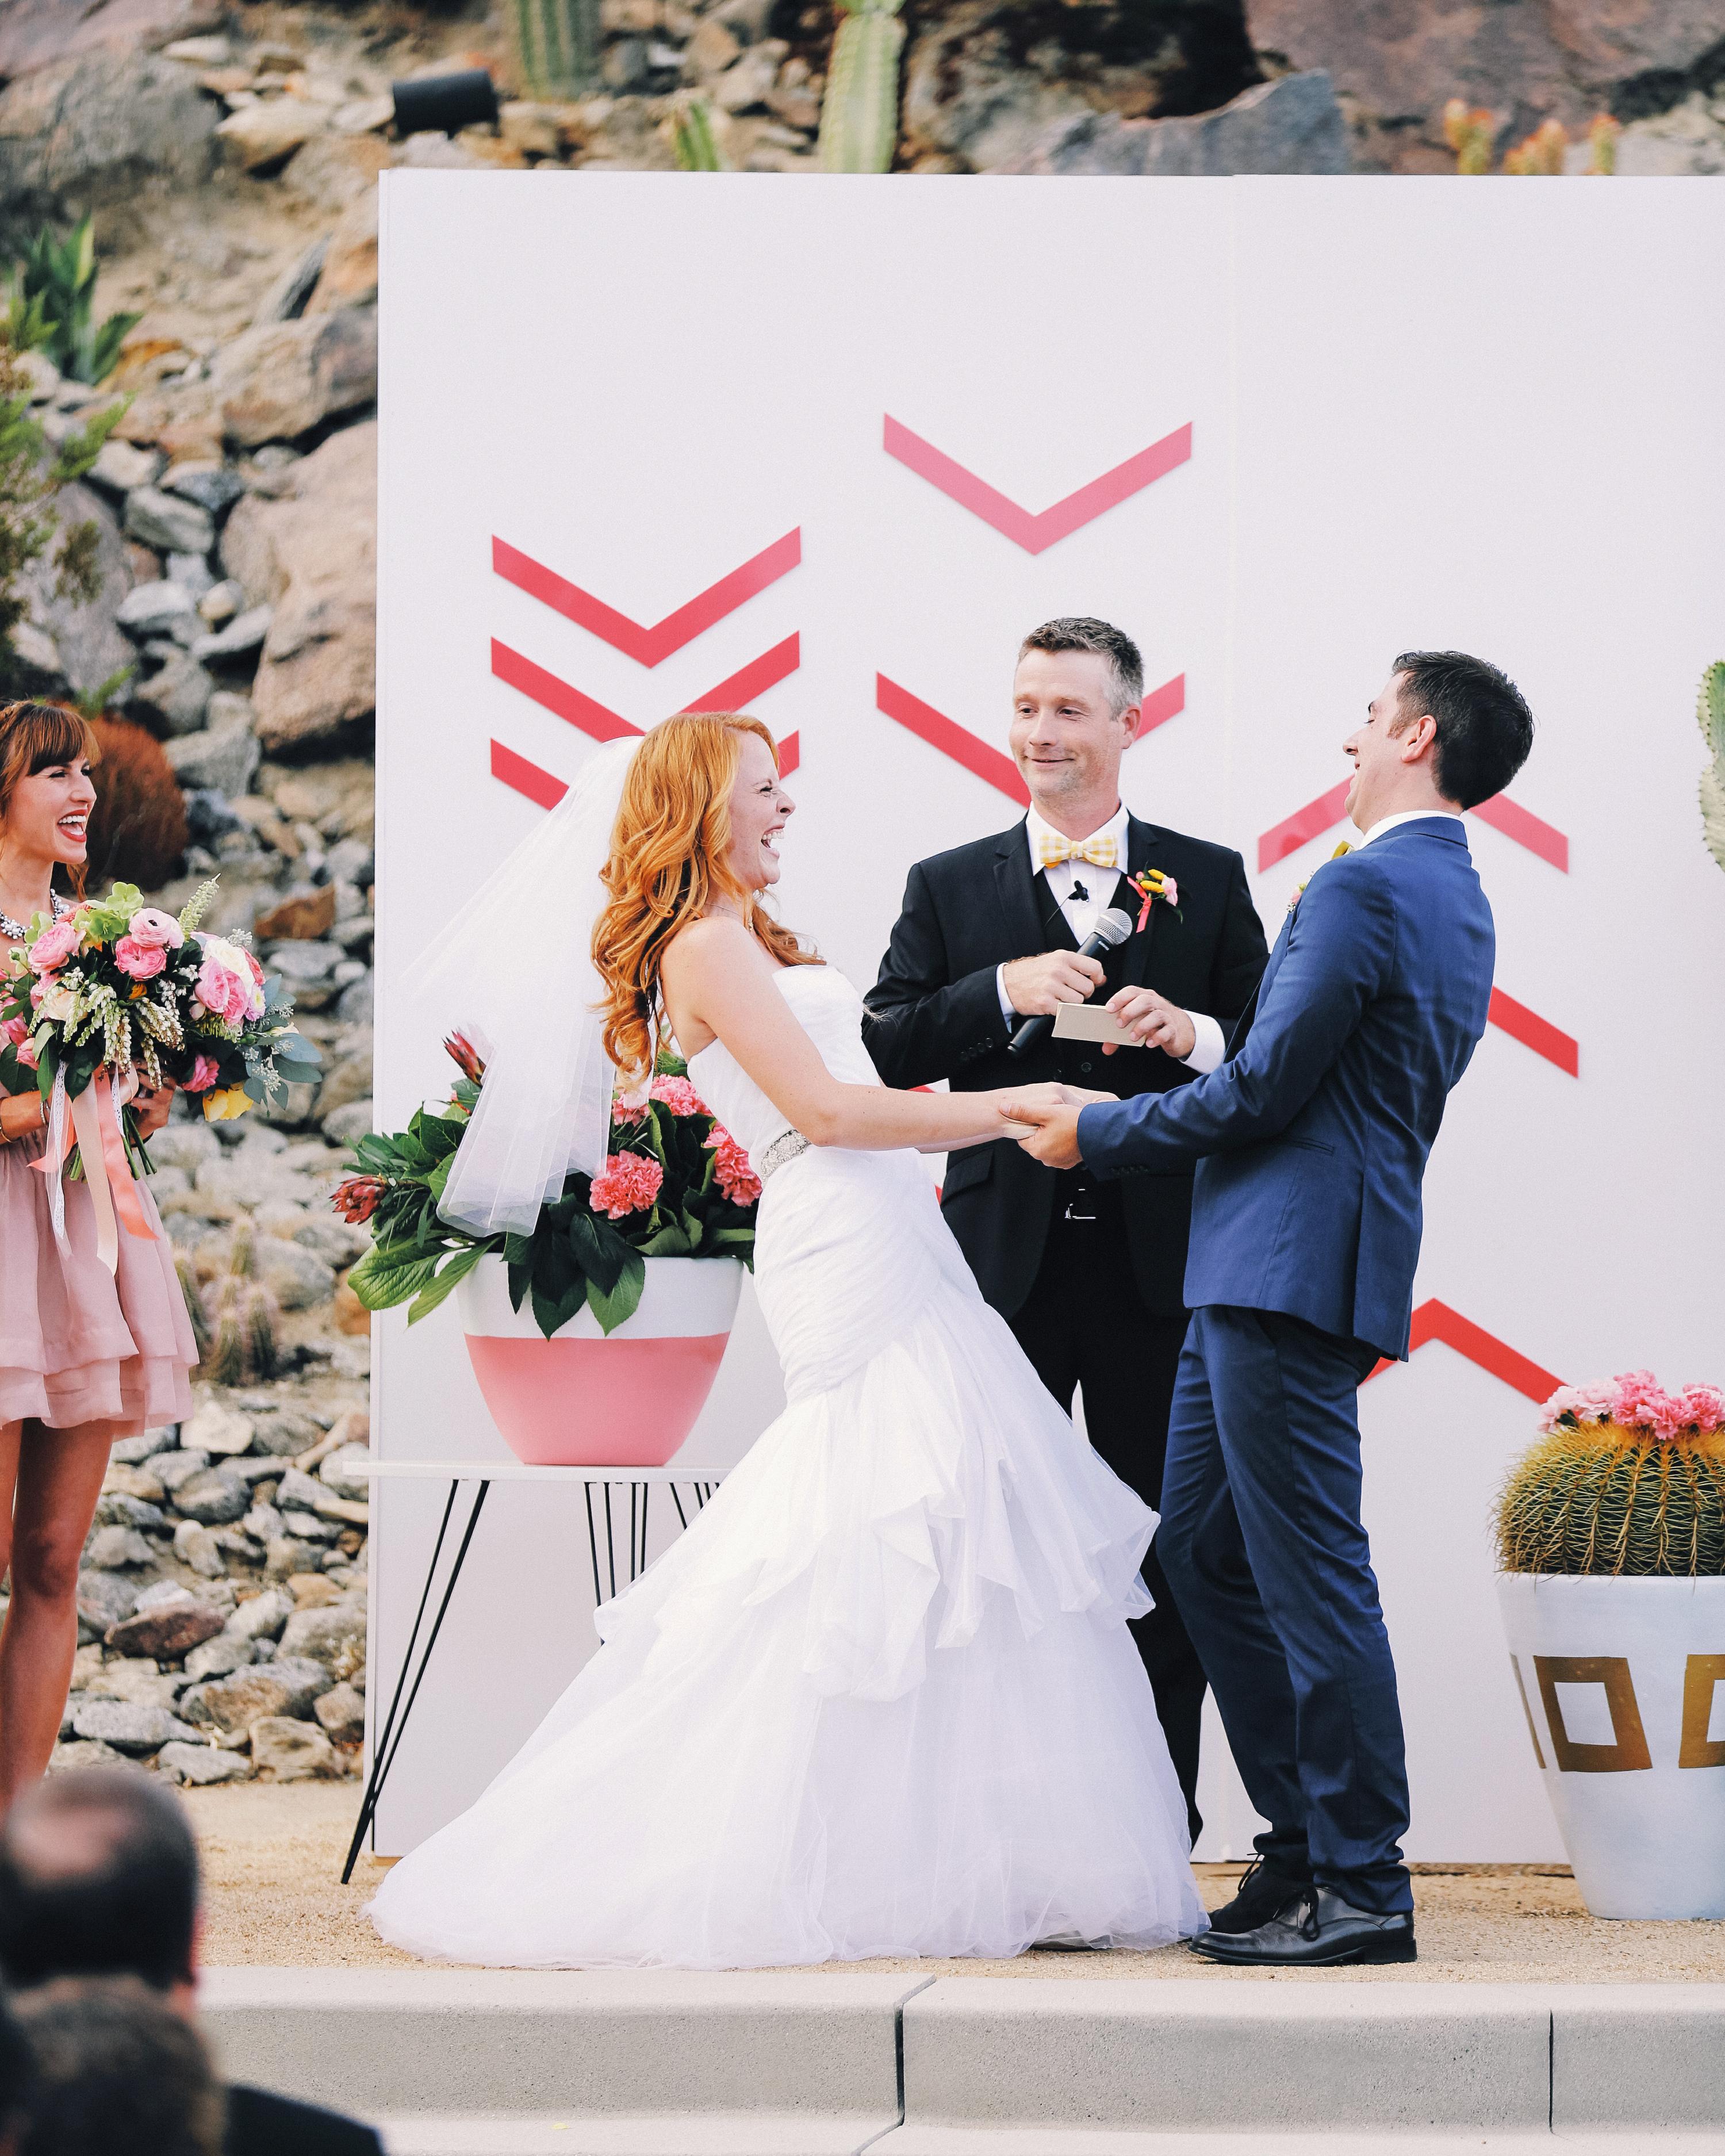 katie-brian-wedding-ceremony-3590-s111885-0515.jpg